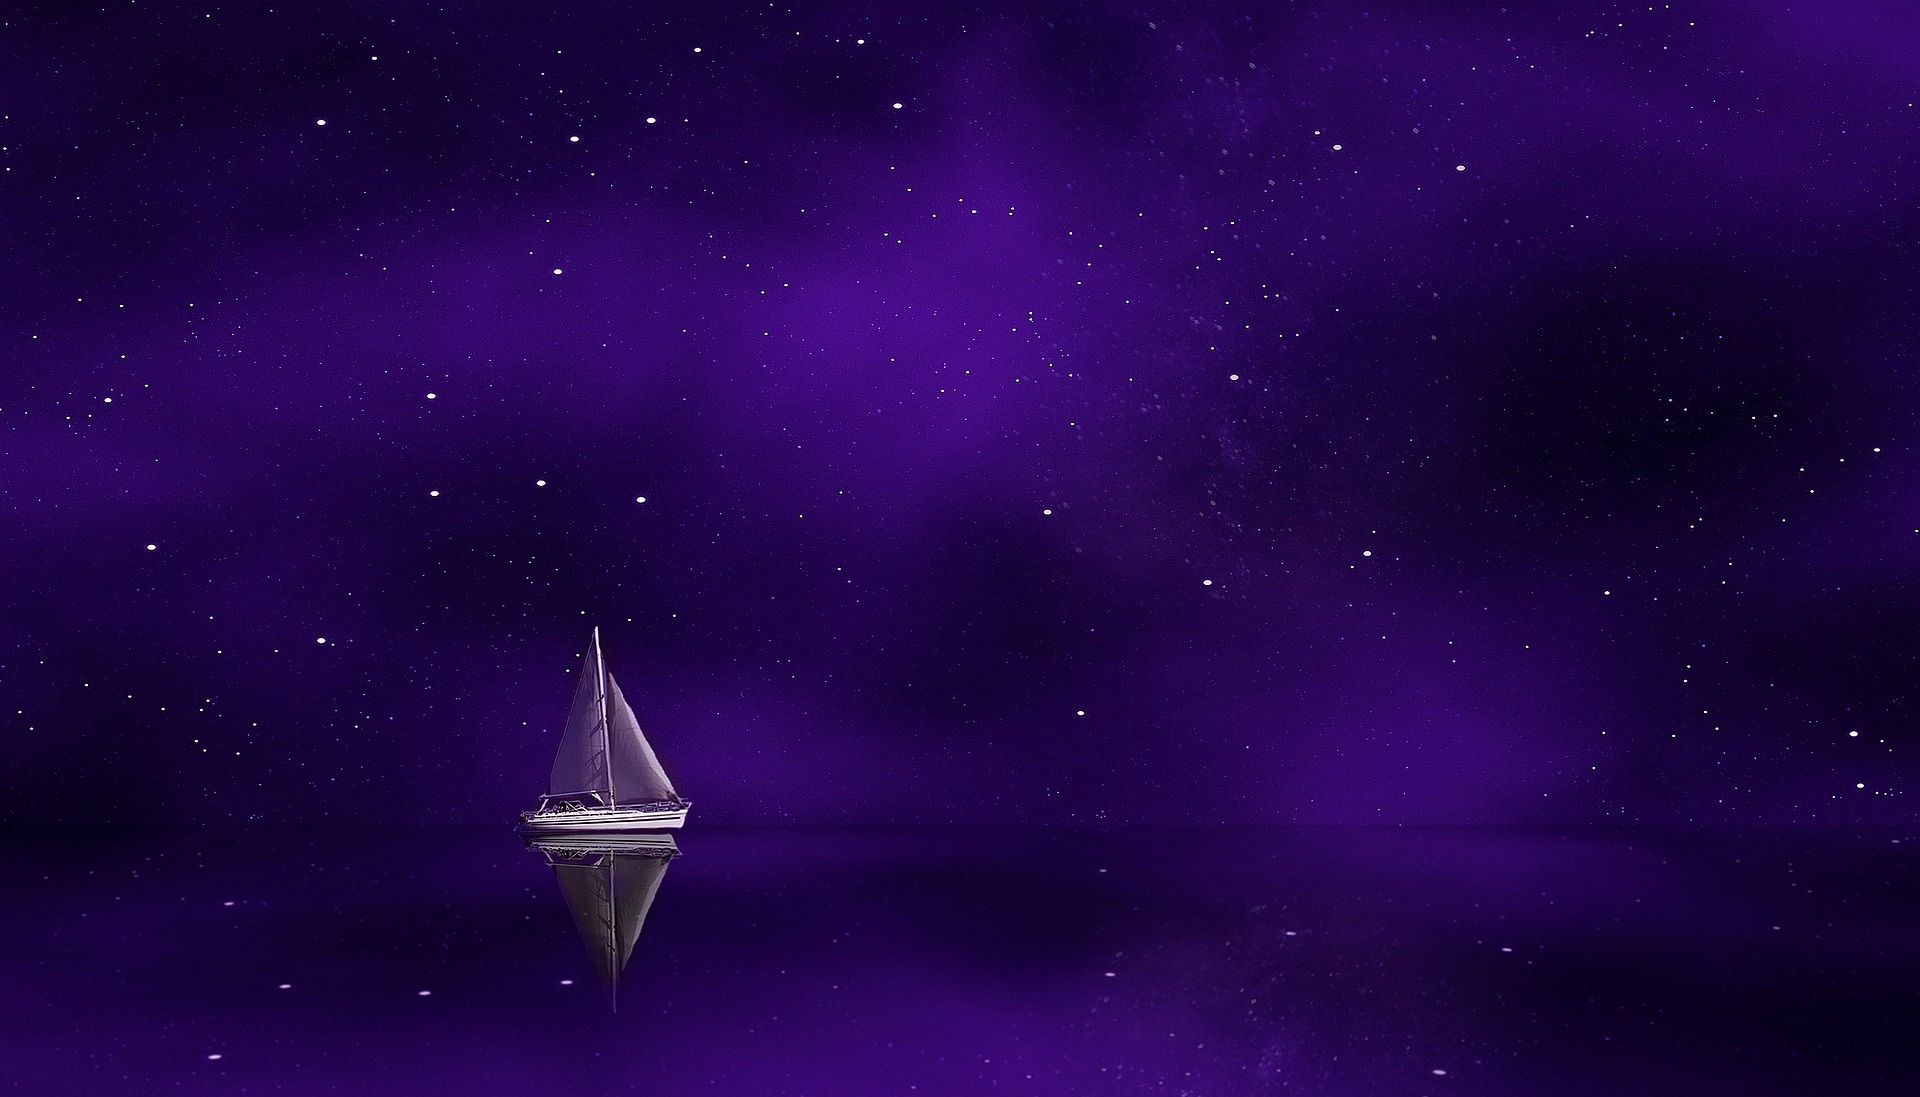 Sailboat_under_purple_sky